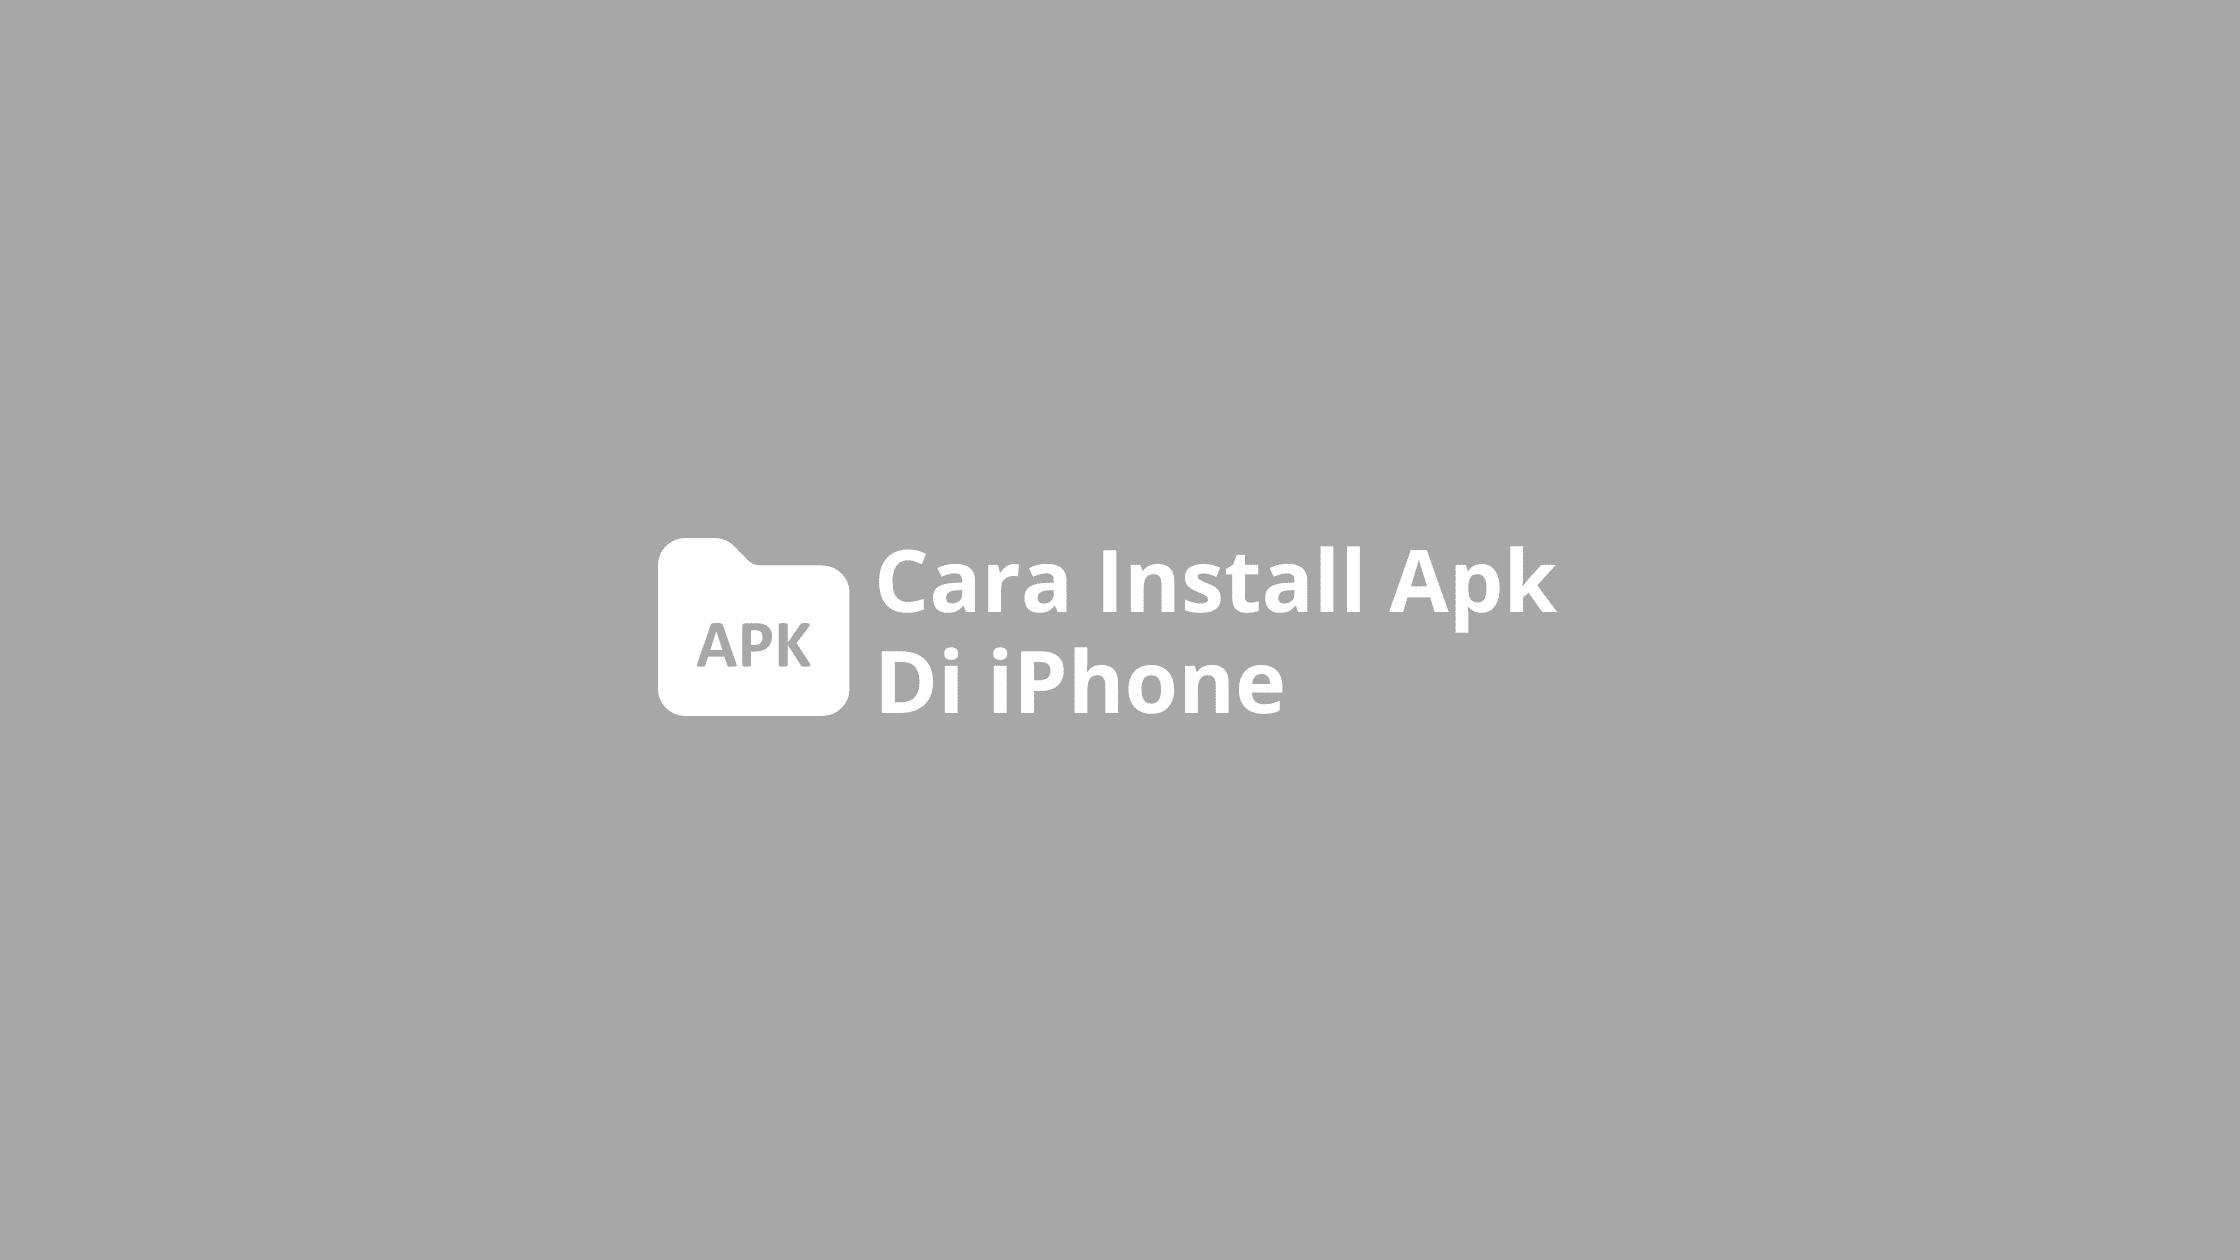 cara instal apk di iphone